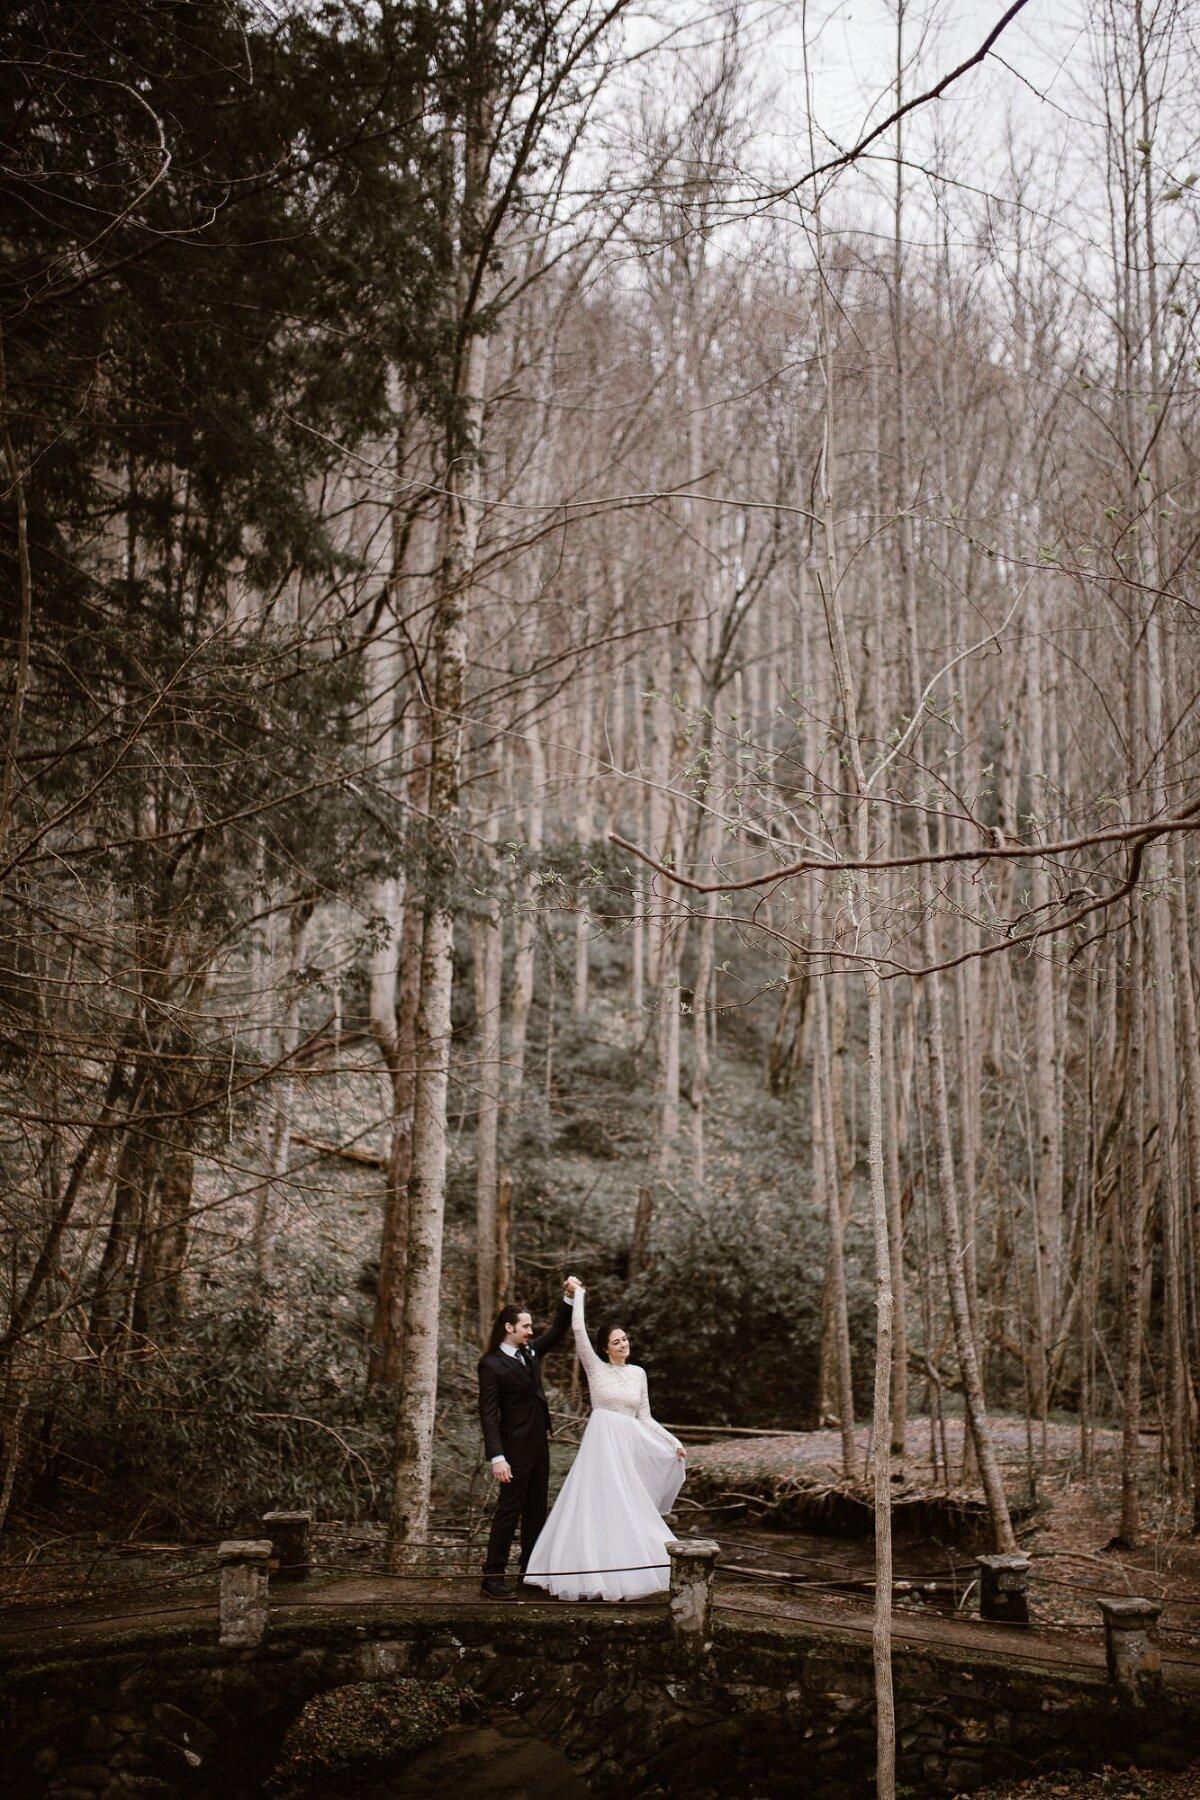 Spence Cabin Wedding Venue